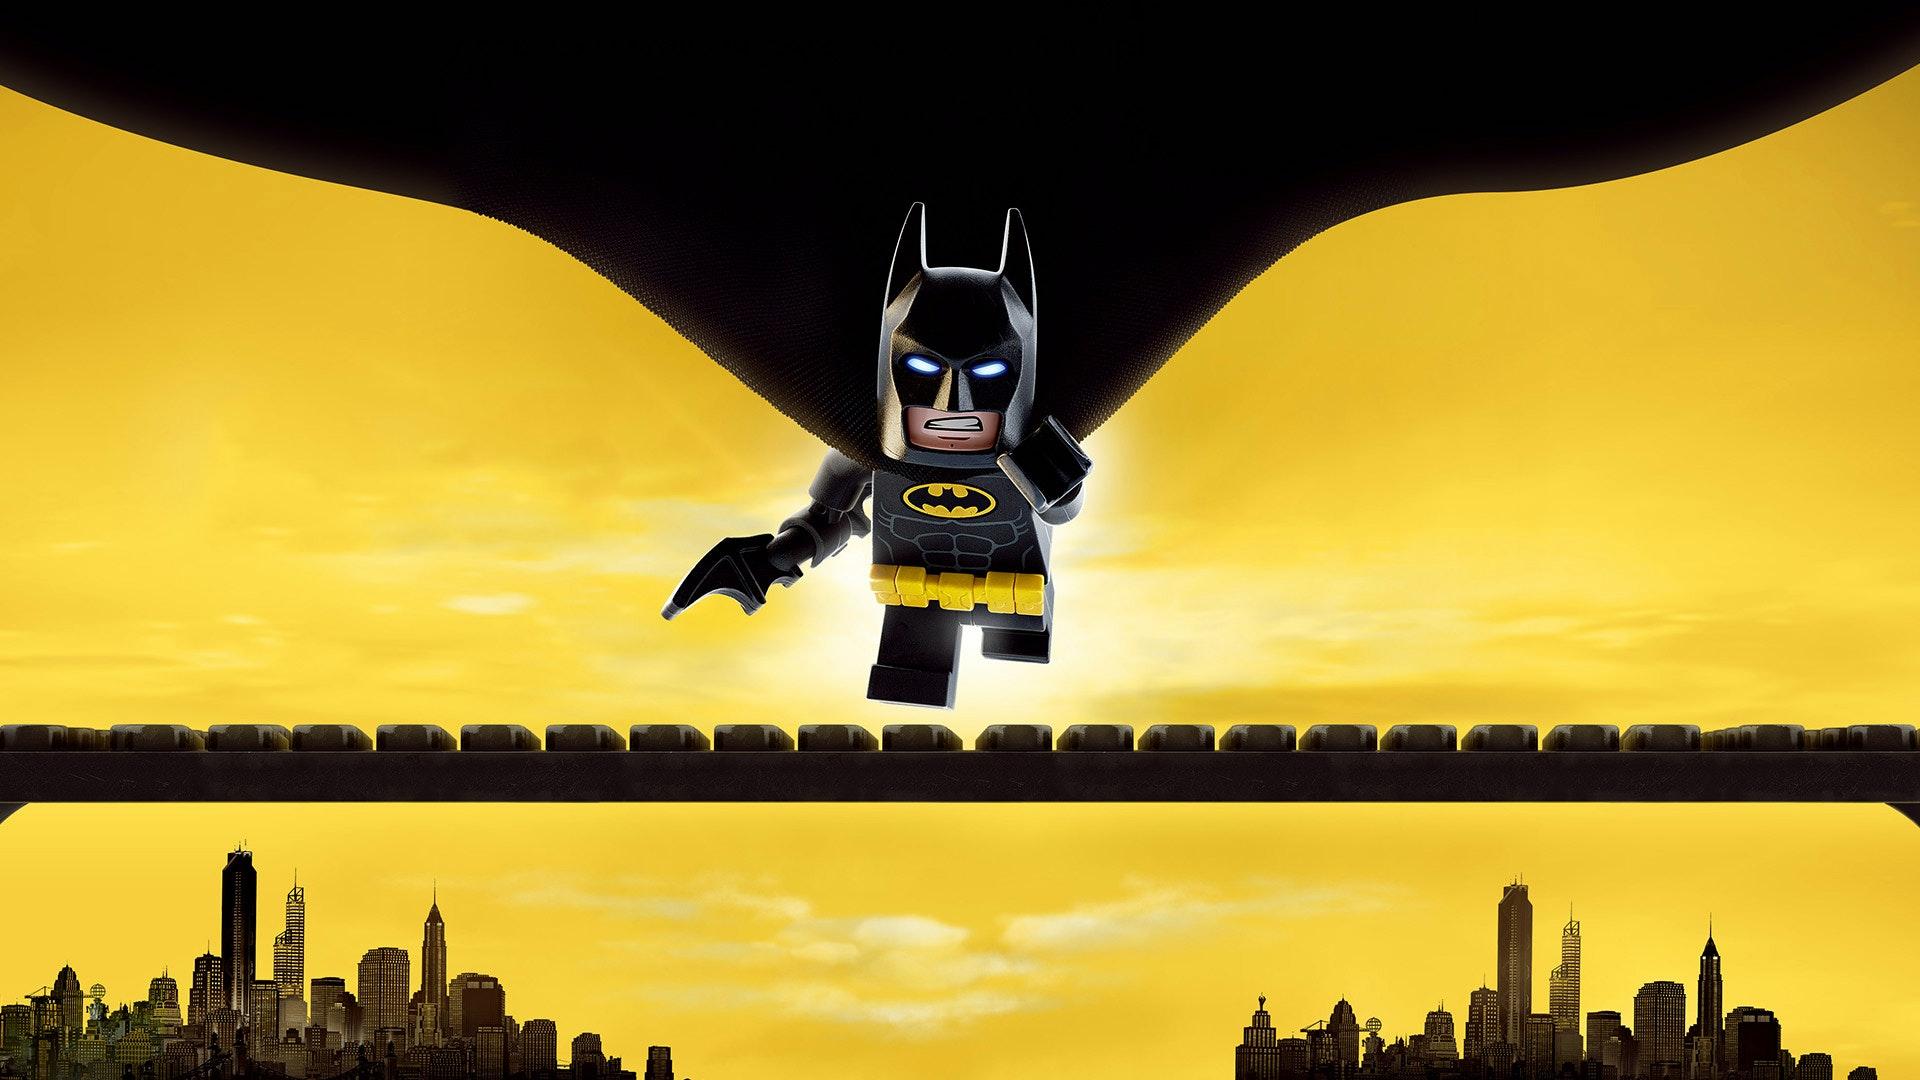 The LEGO Batman Movie (2017) Soundtrack